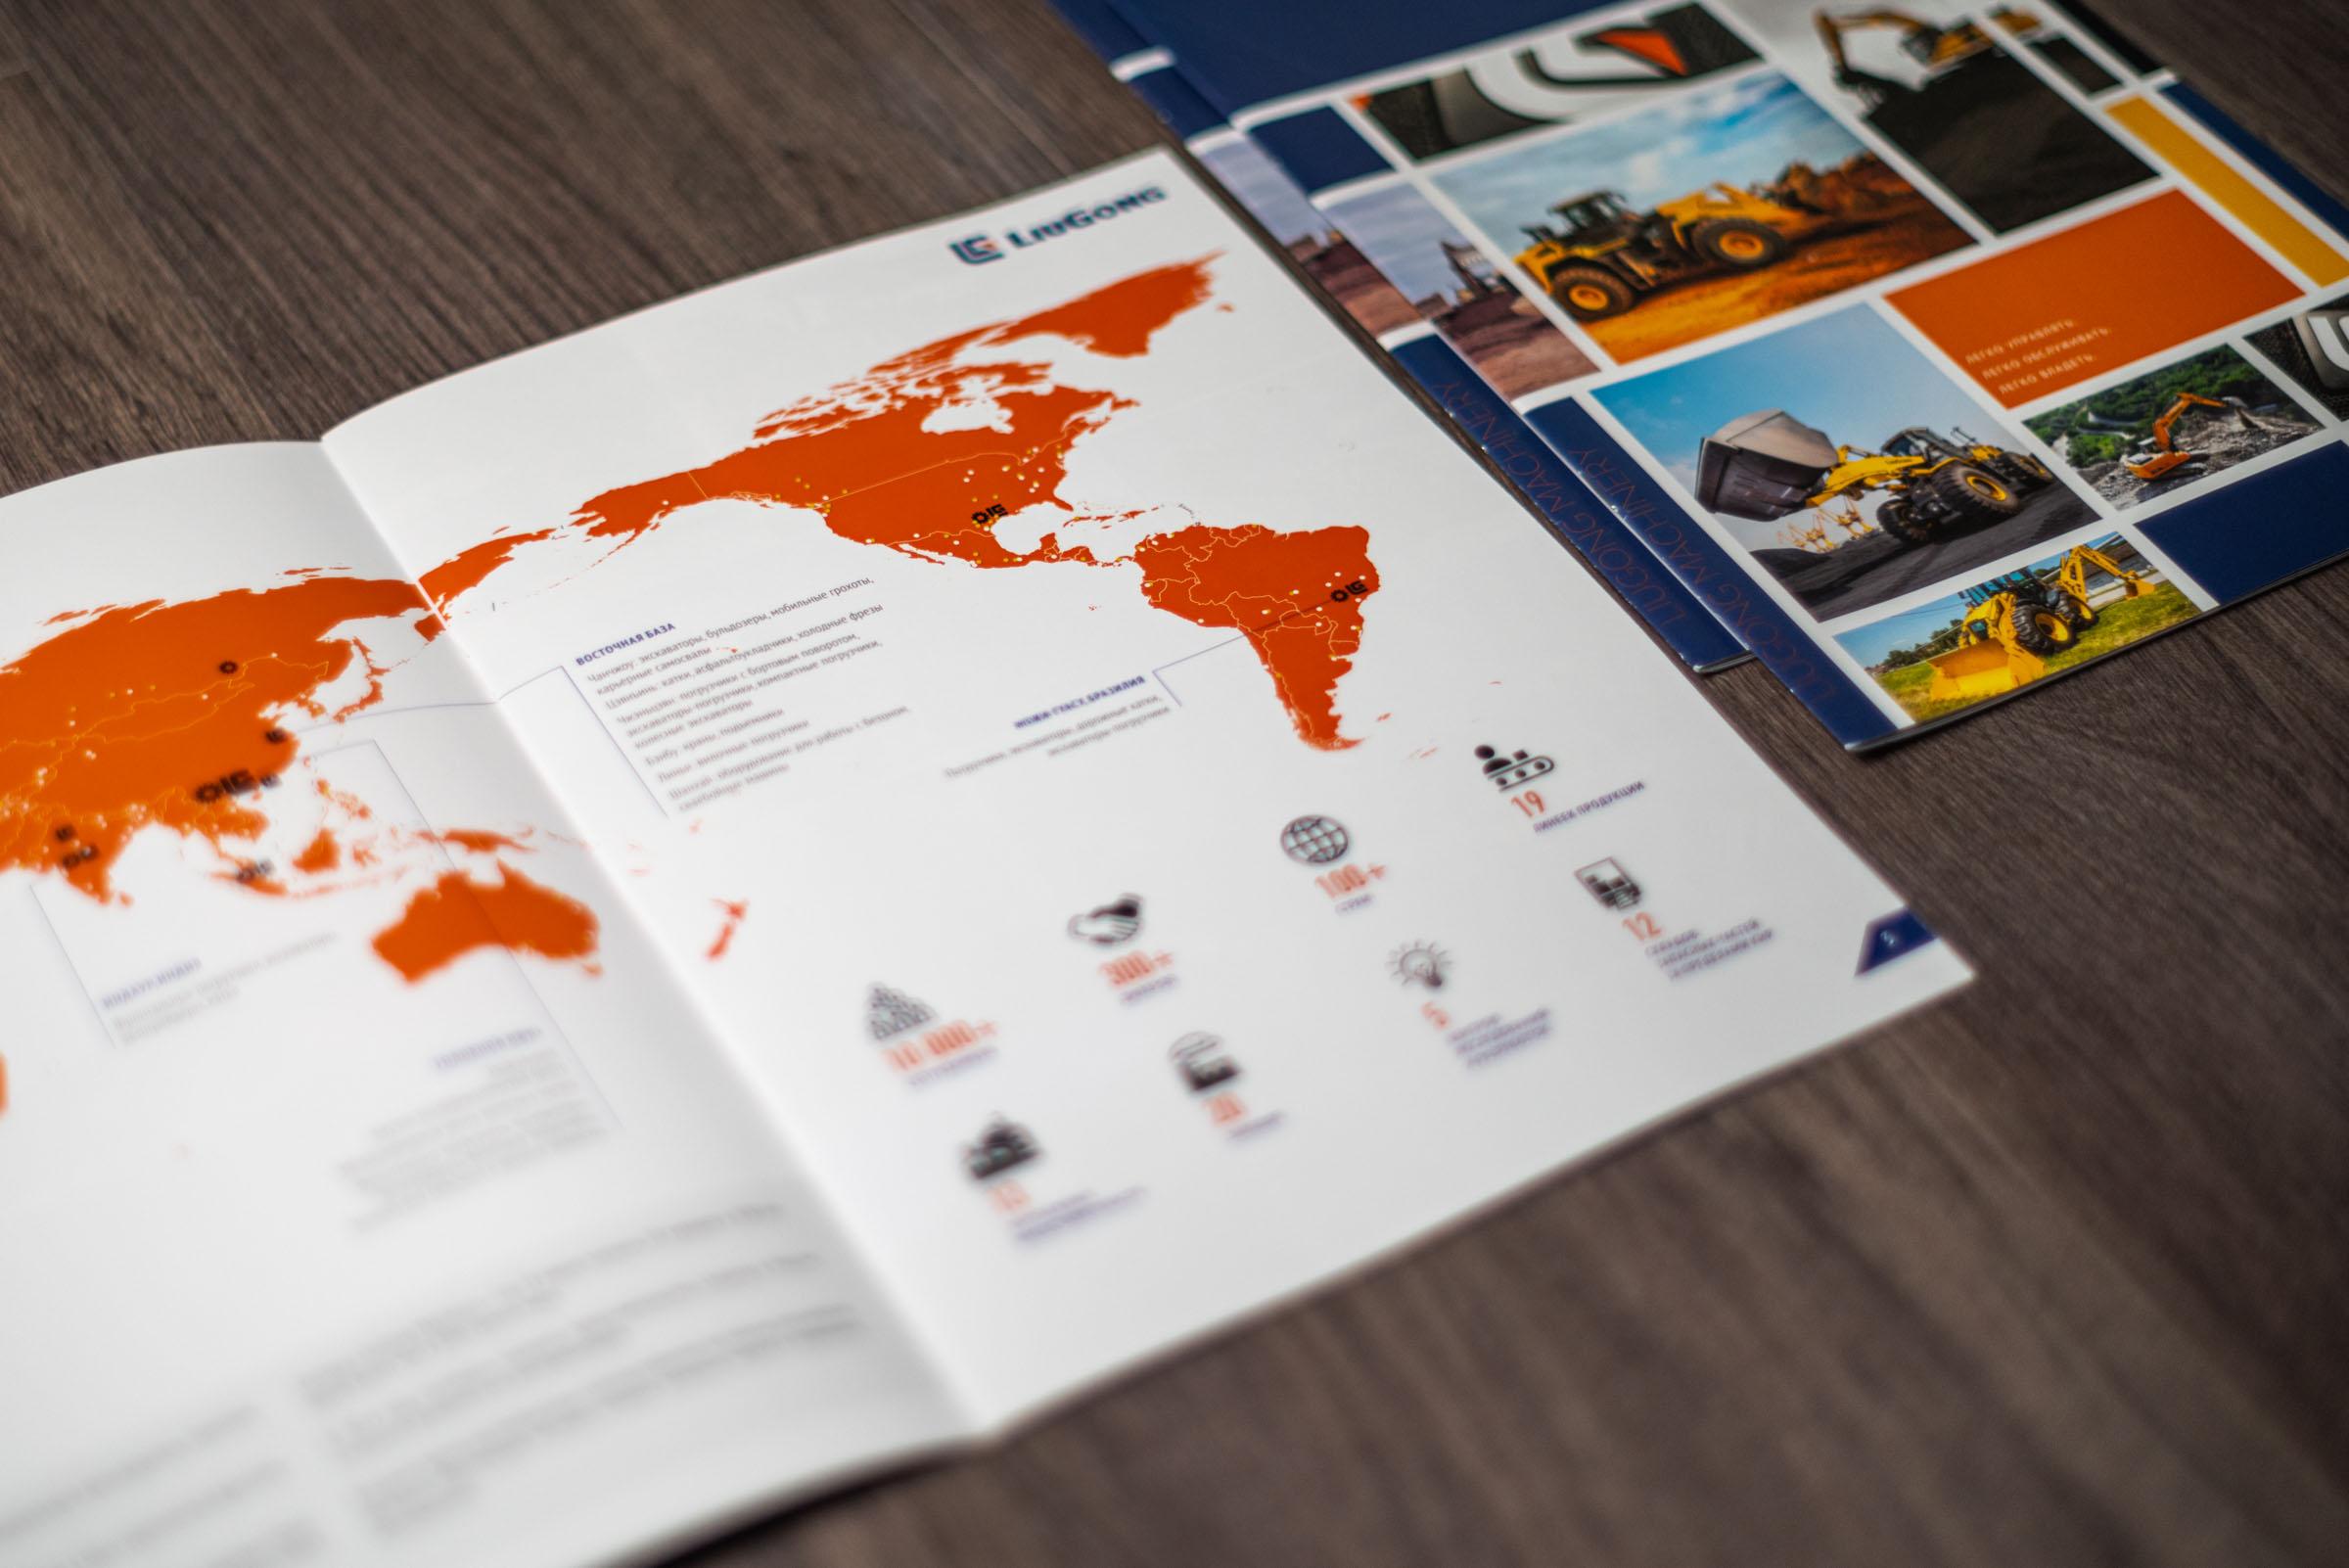 разработка каталога техники, развороты с картой